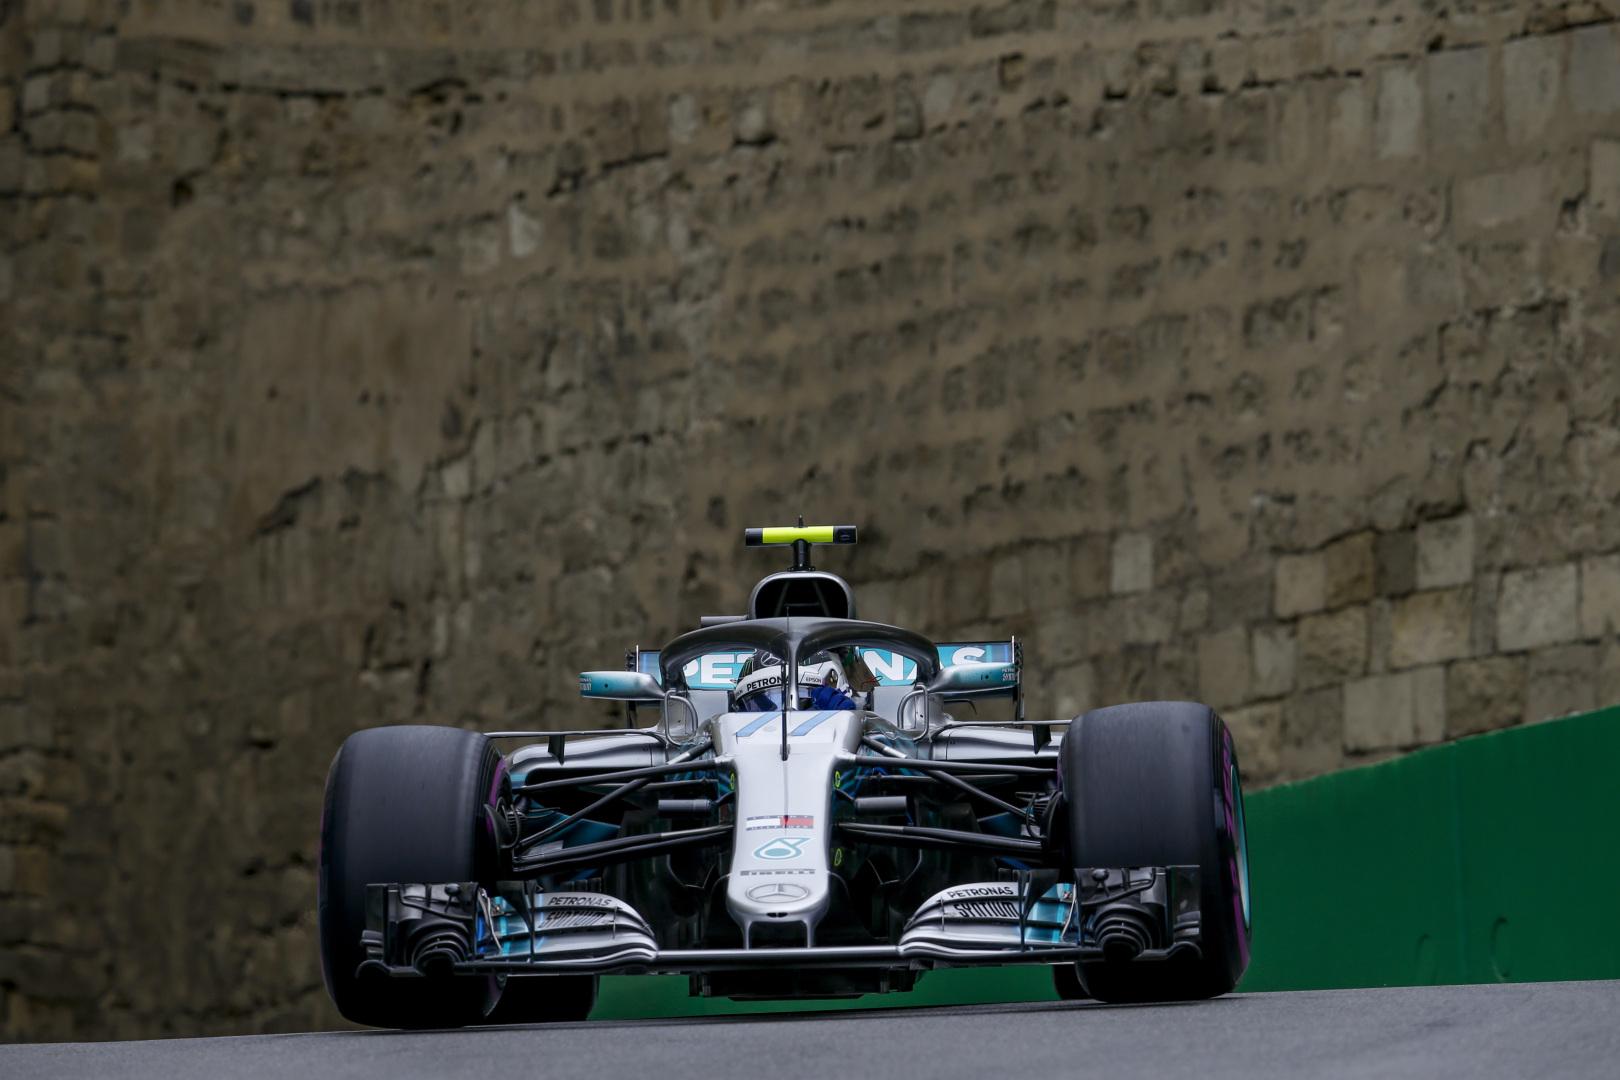 F1: Bottas majdnem faképnél hagyta a Mercedest